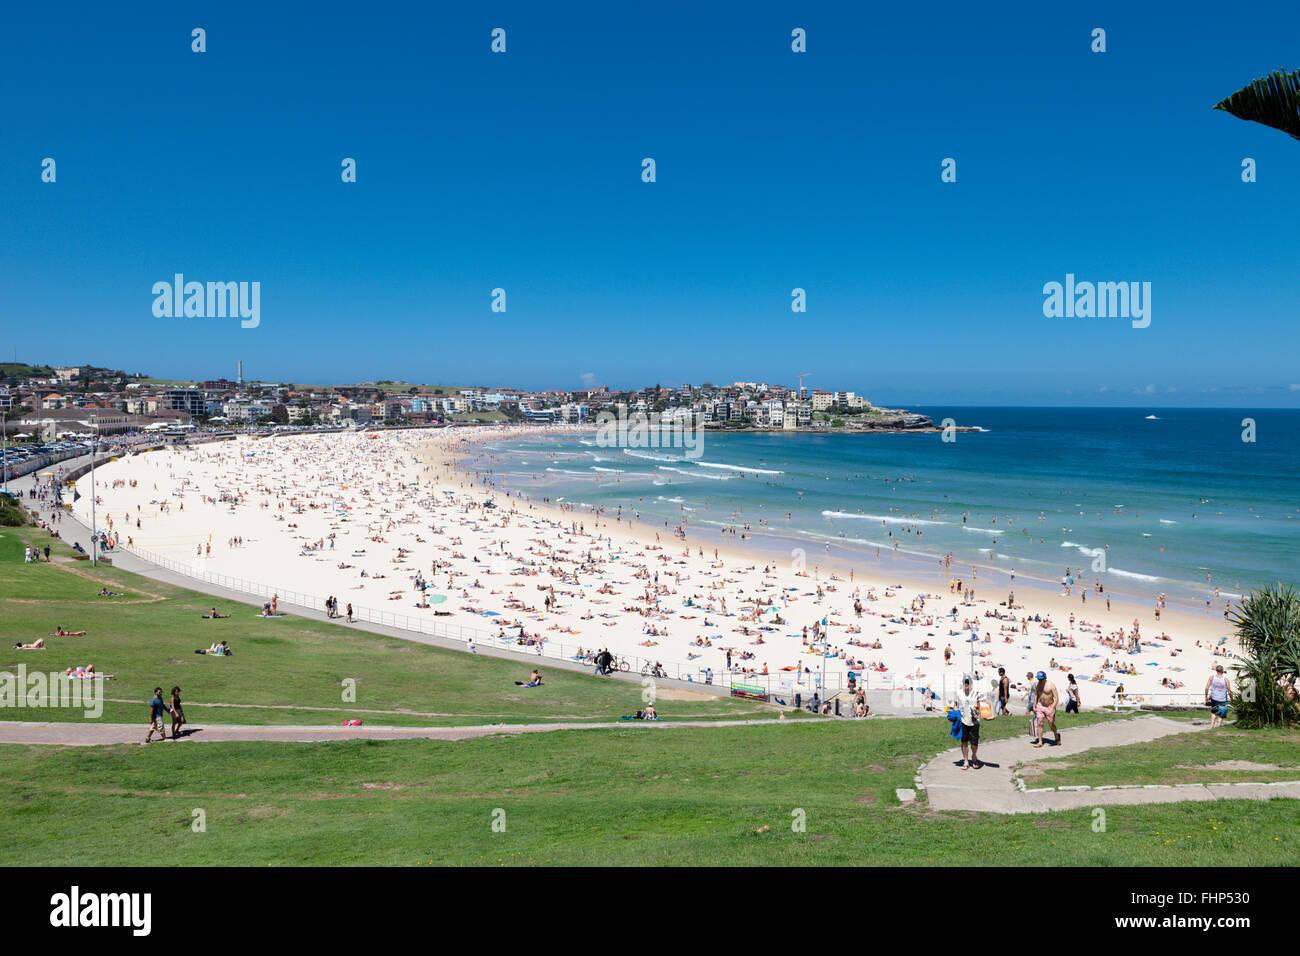 Sydney's iconic Bondi Beach, busy on a hot summer day - Stock Image